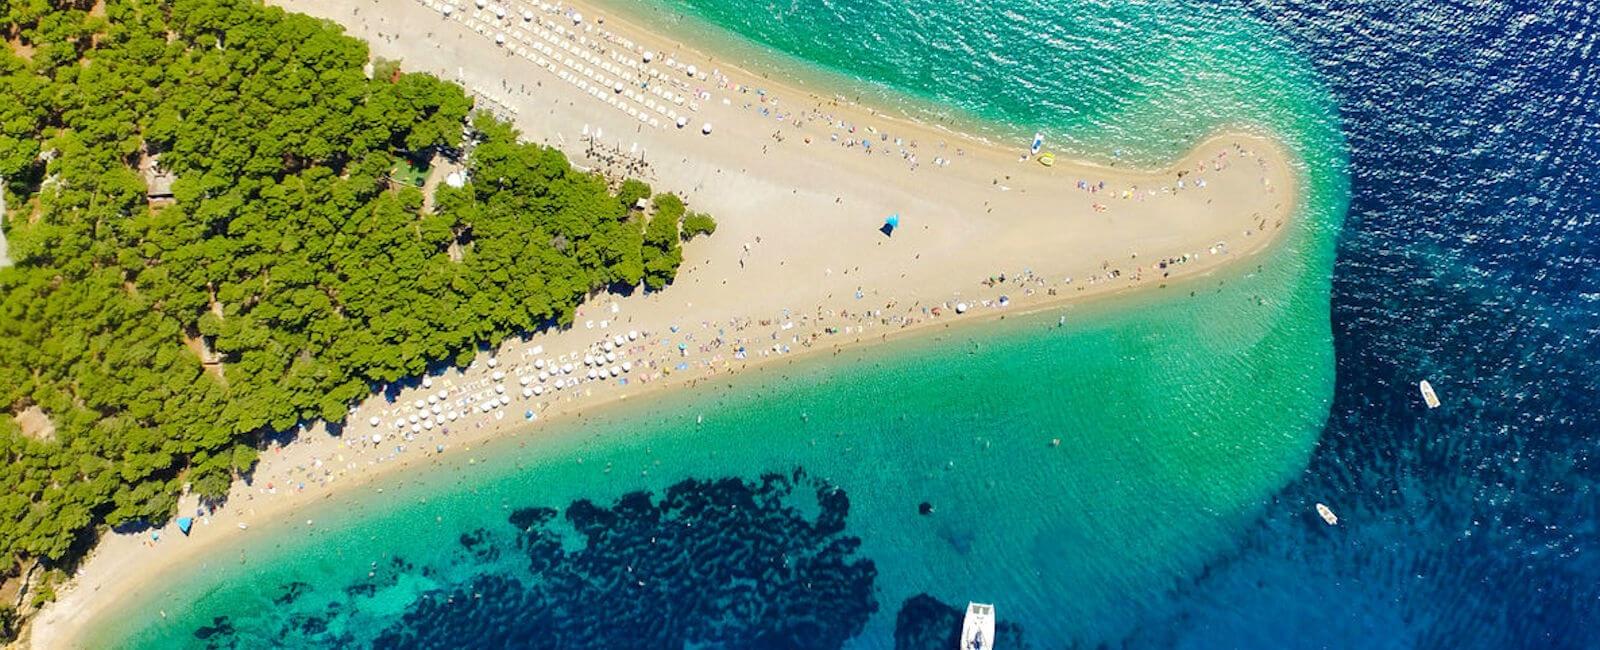 zlatni rat, brac island beach